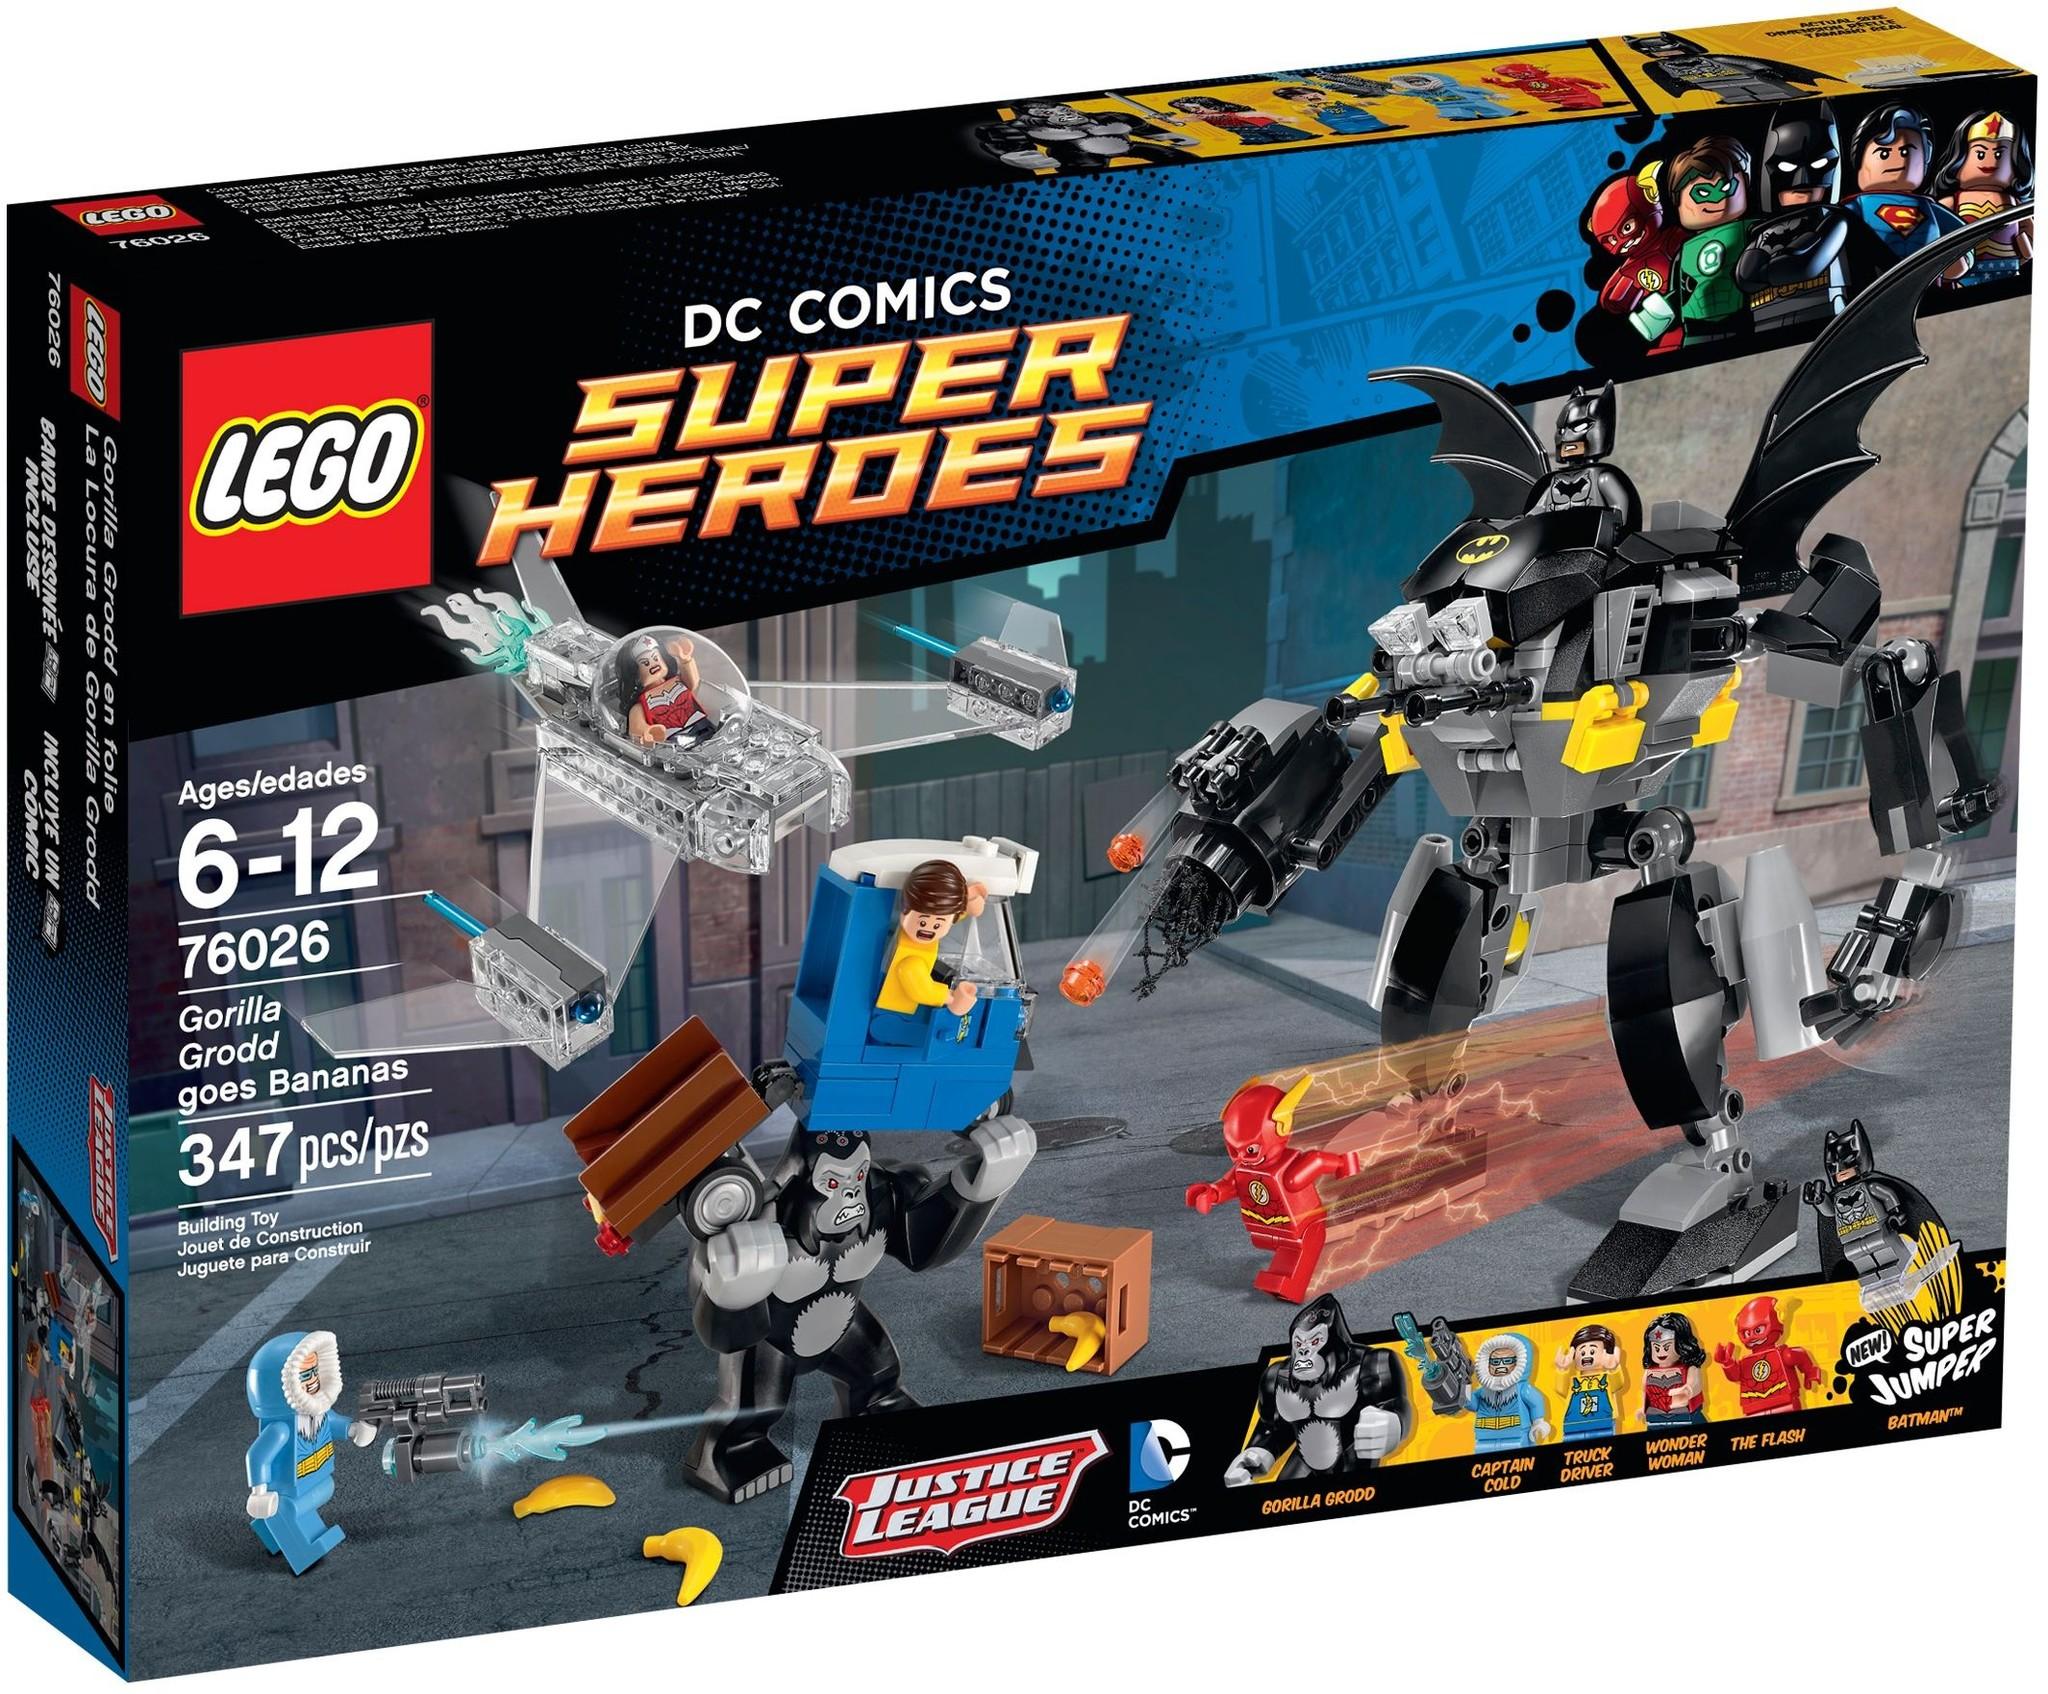 LEGO 76026 - Super Heroes - Gorilla Grodd Goes Bananas